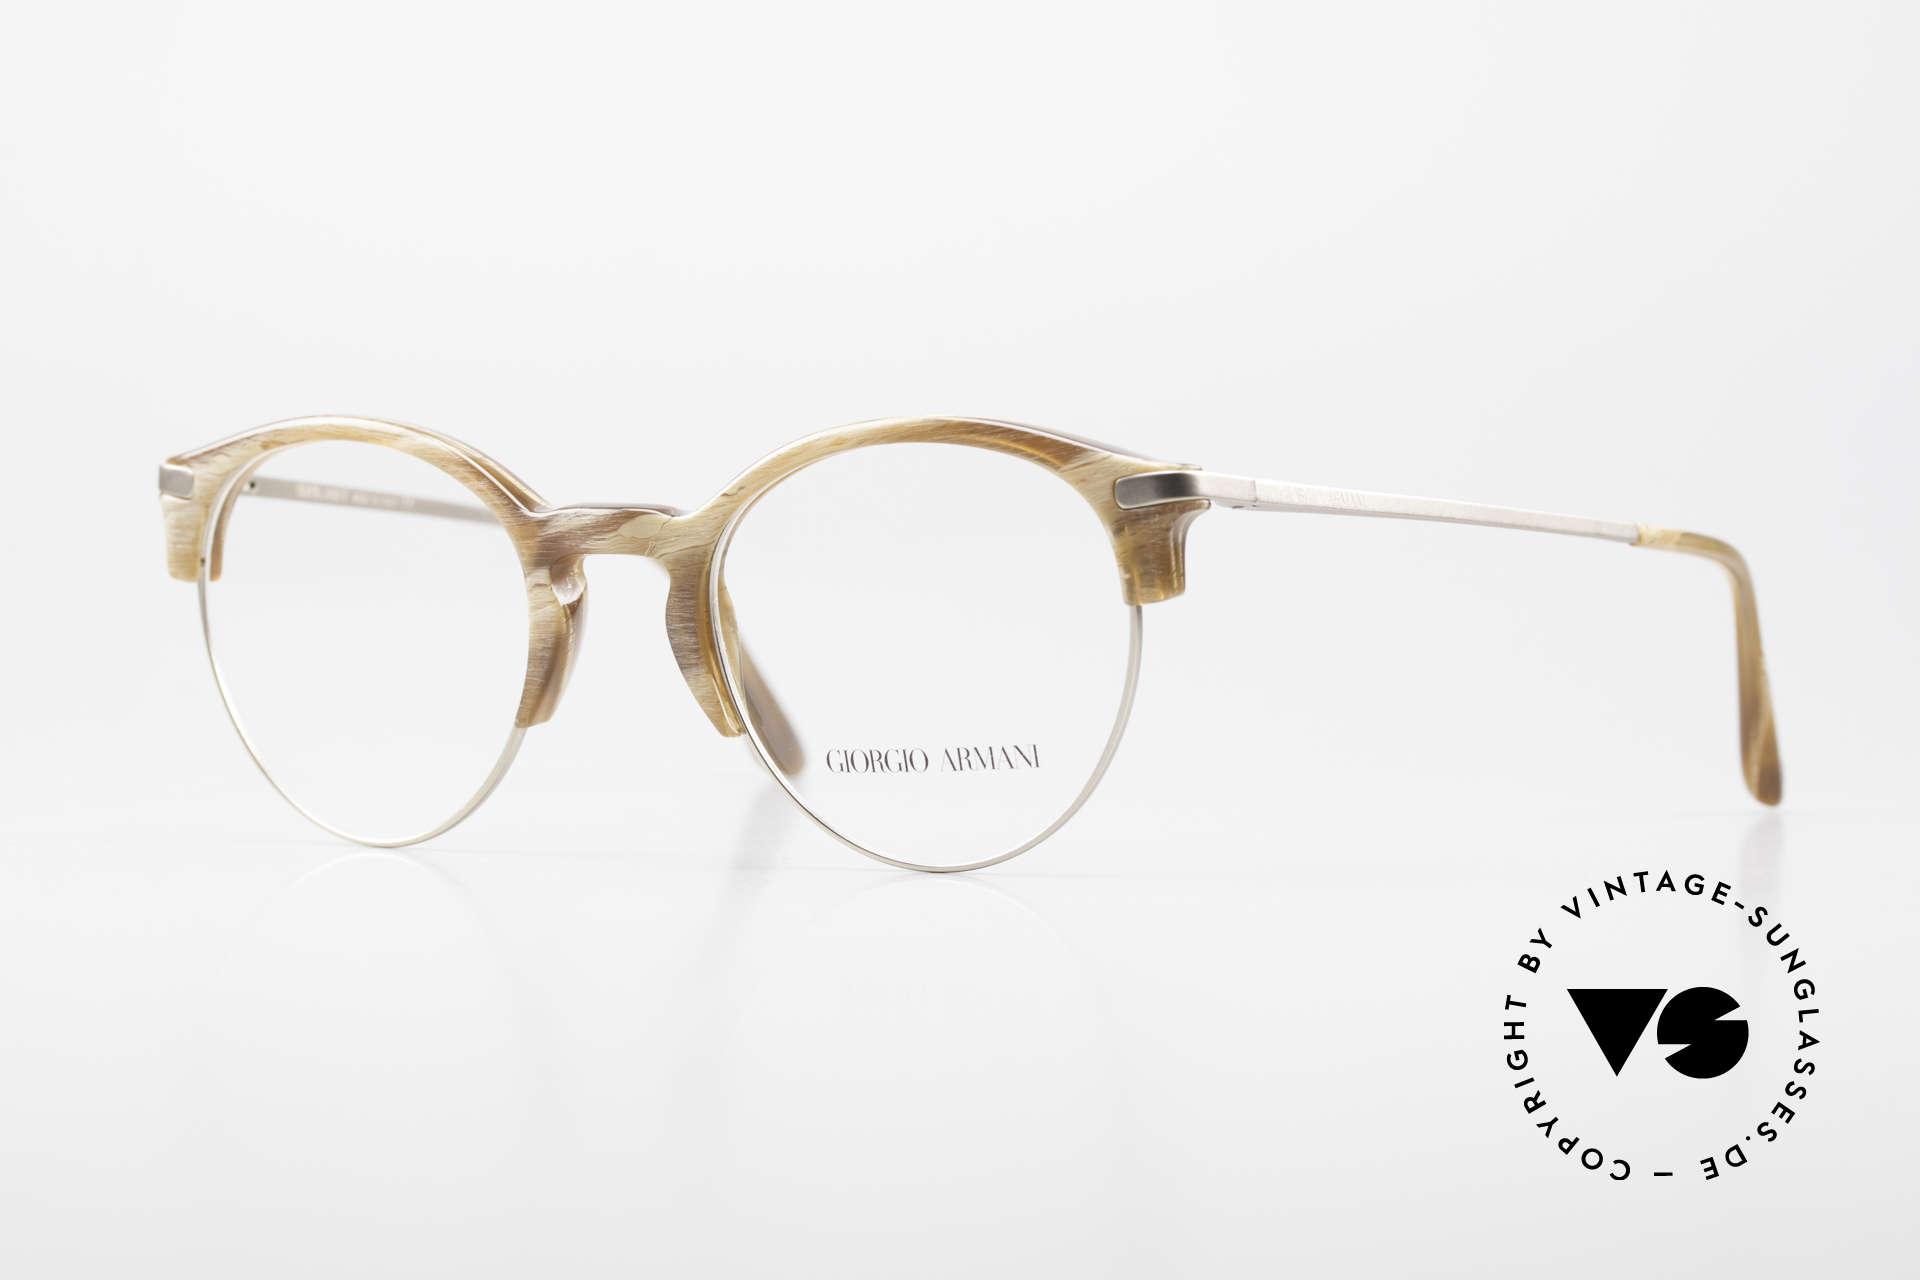 Giorgio Armani 7014 Panto Frame With Spring Hinges, timeless Giorgio Armani 'Frames of Life' eyeglasses, Made for Men and Women